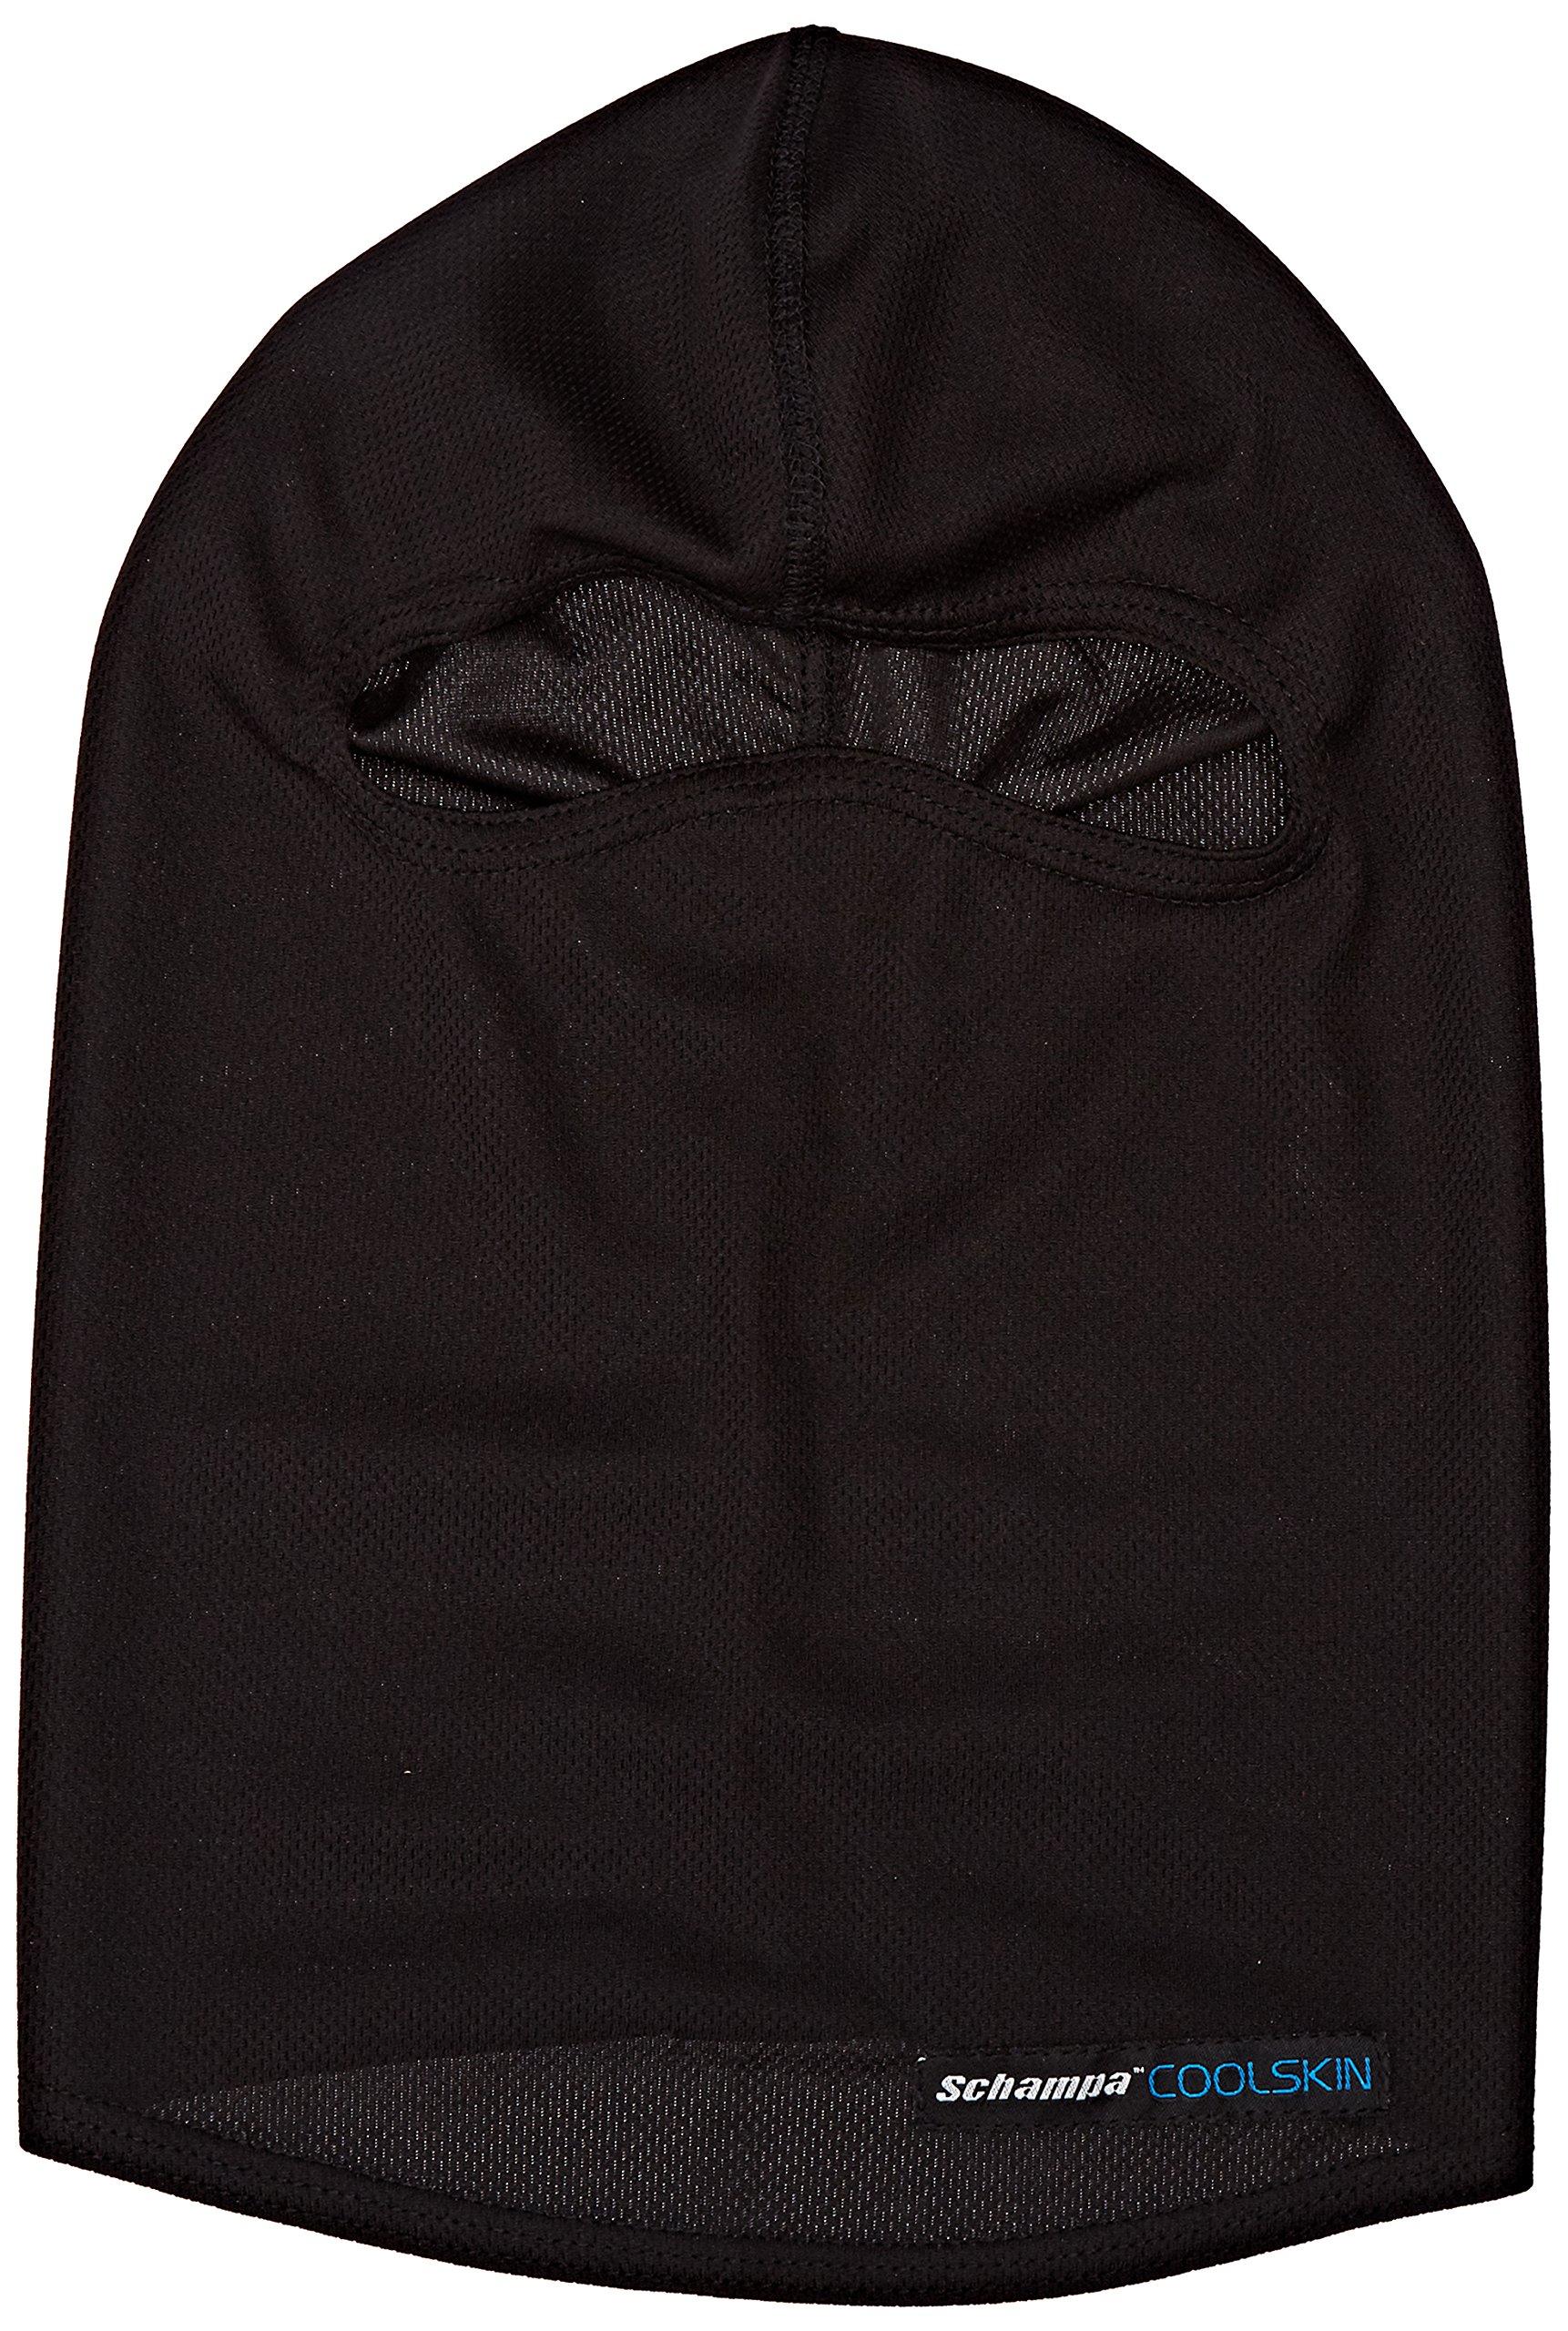 Schampa CoolSkin Balaclava (Black, One Size) by Schampa